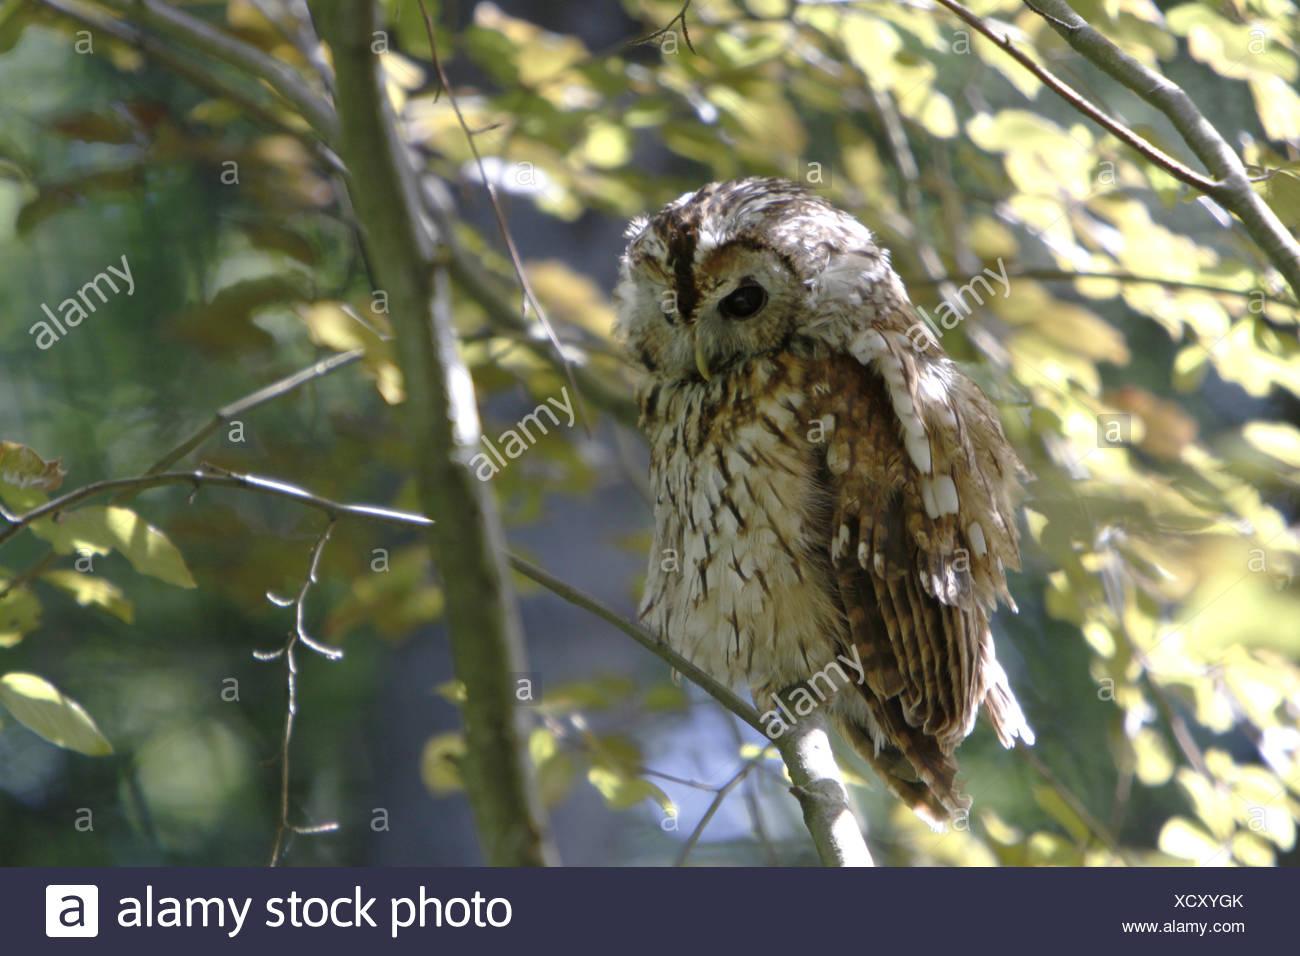 animal bird birds - Stock Image